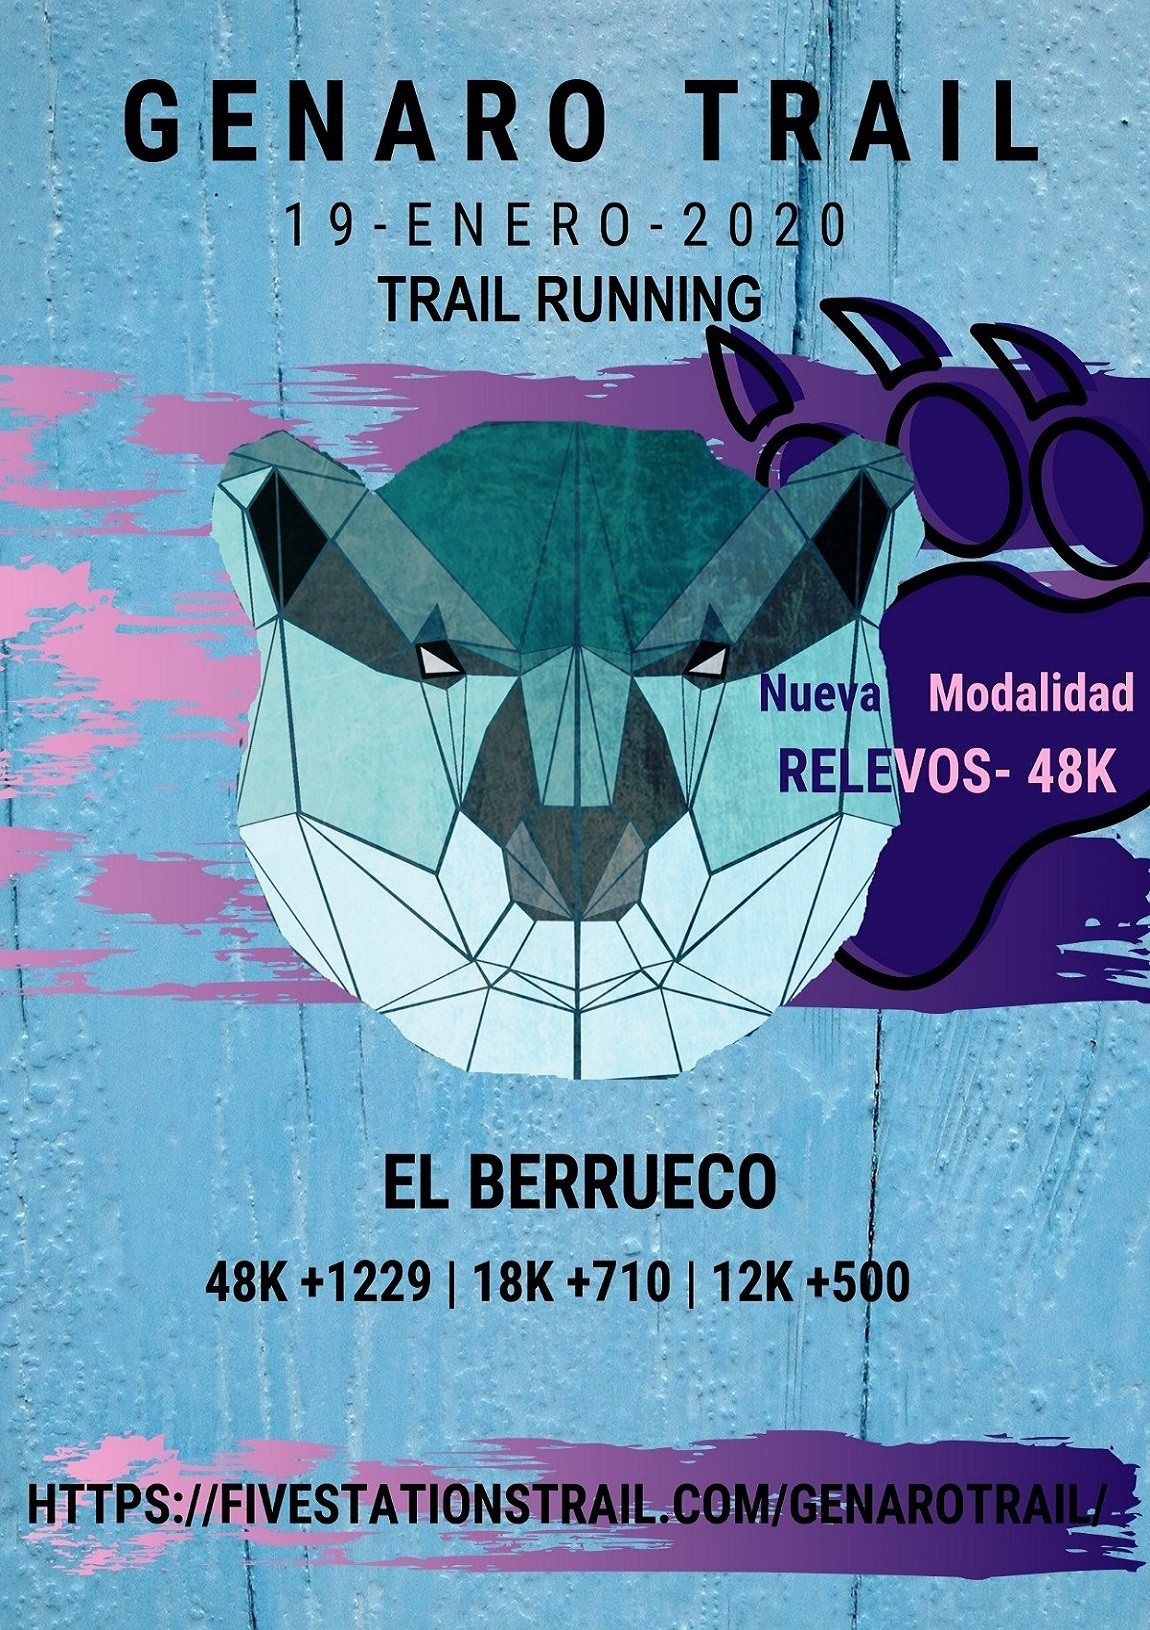 Genaro Trail